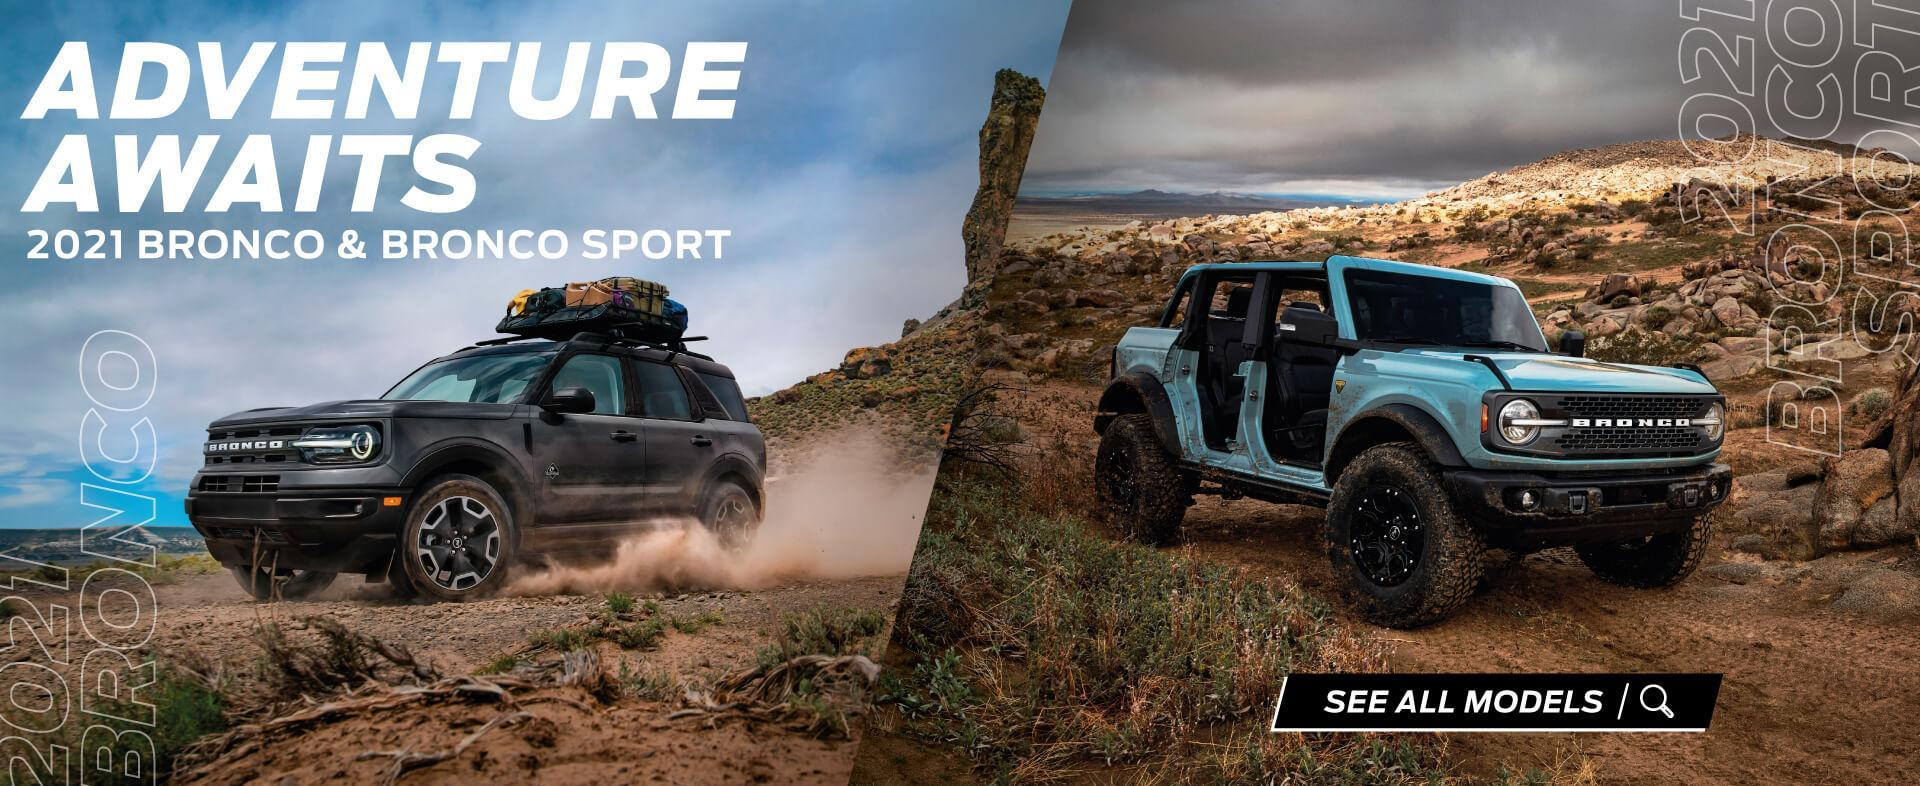 Bronco & Bronco Sport